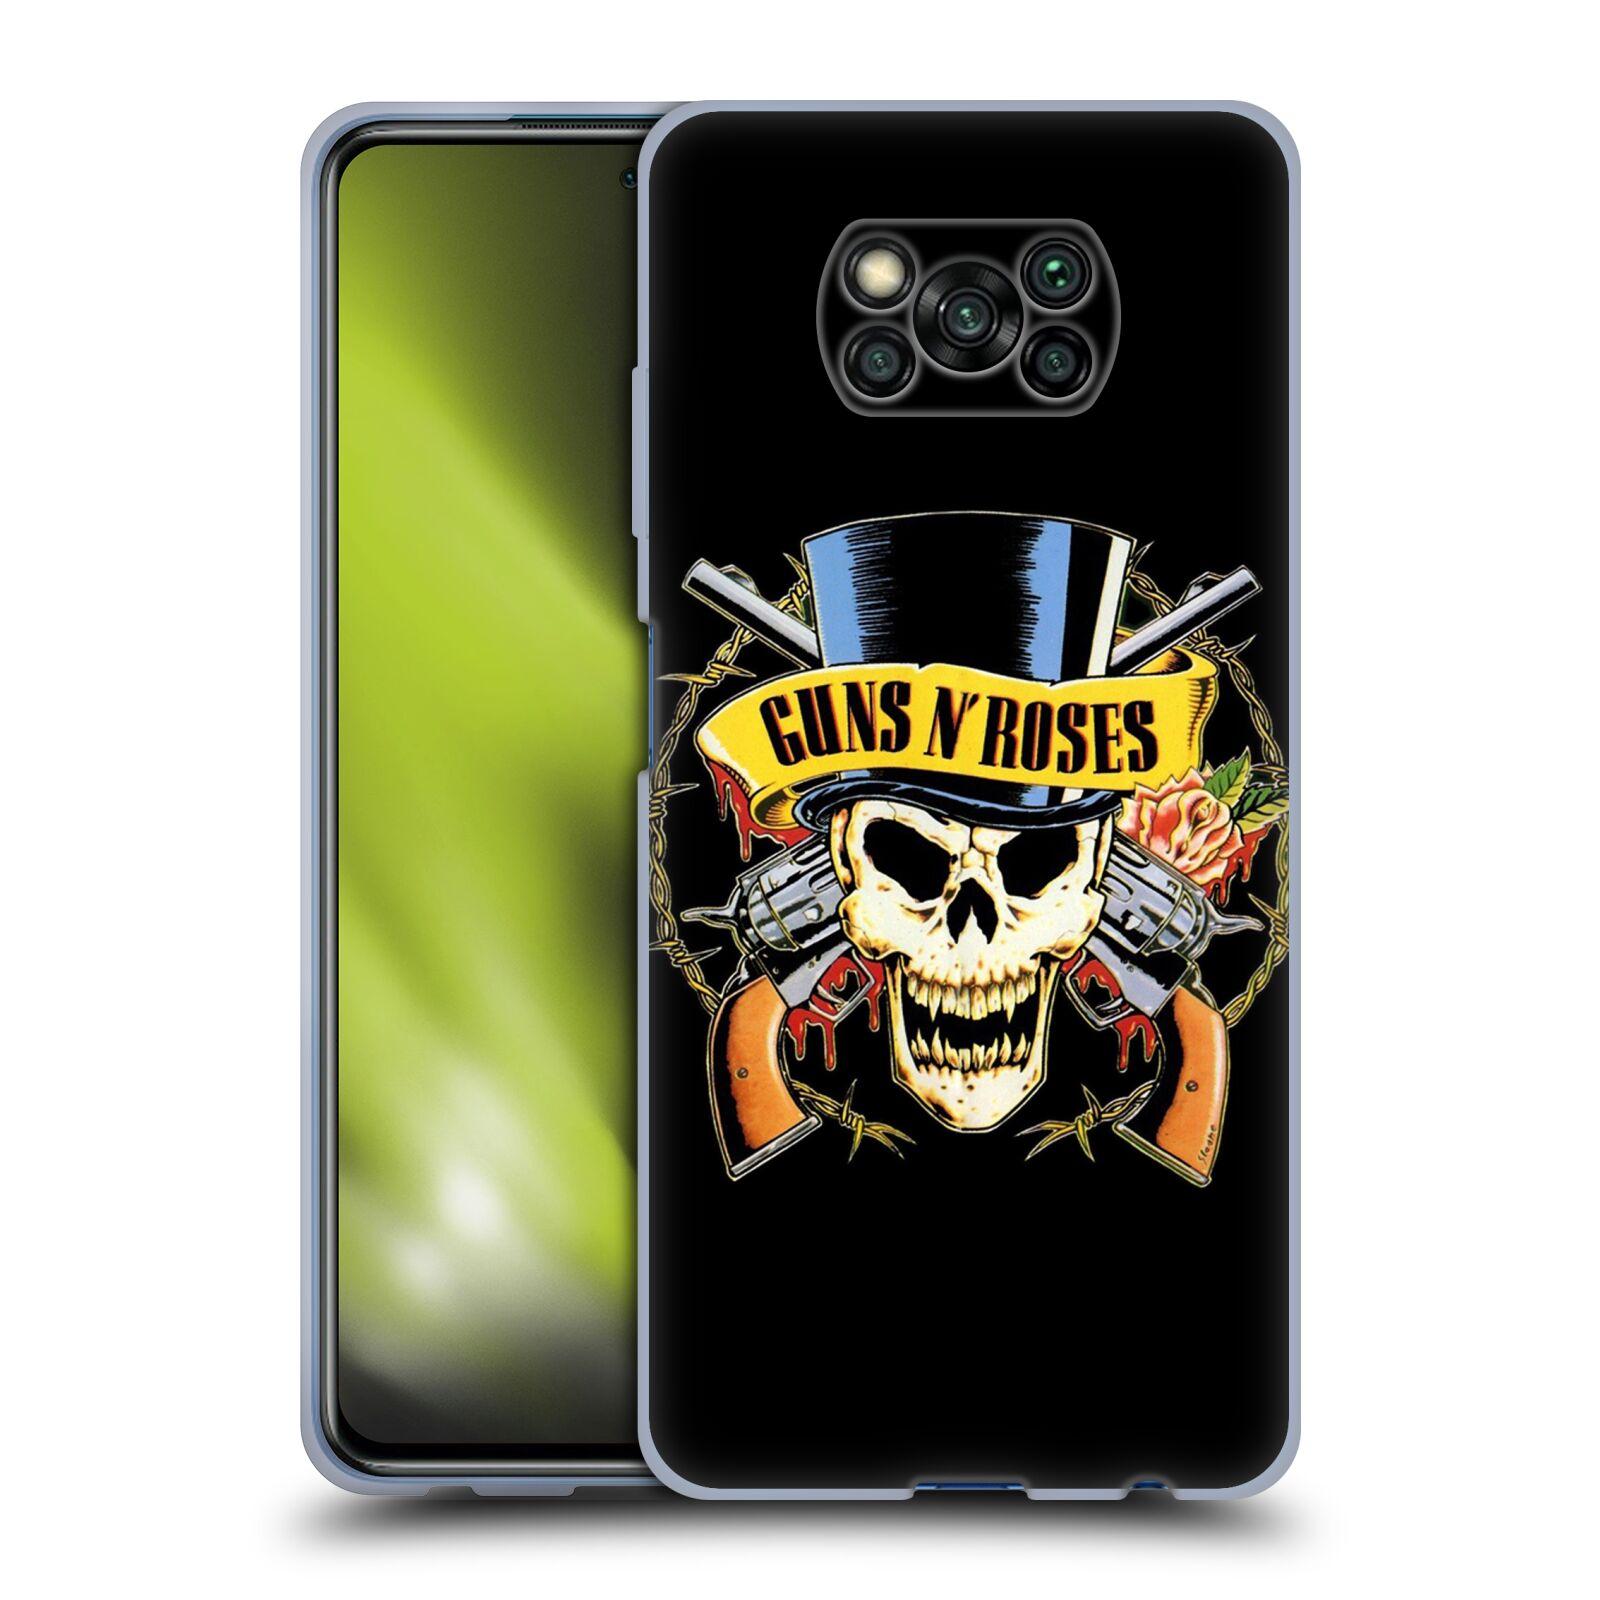 Silikonové pouzdro na mobil Xiaomi Poco X3 NFC - Head Case - Guns N' Roses - Lebka